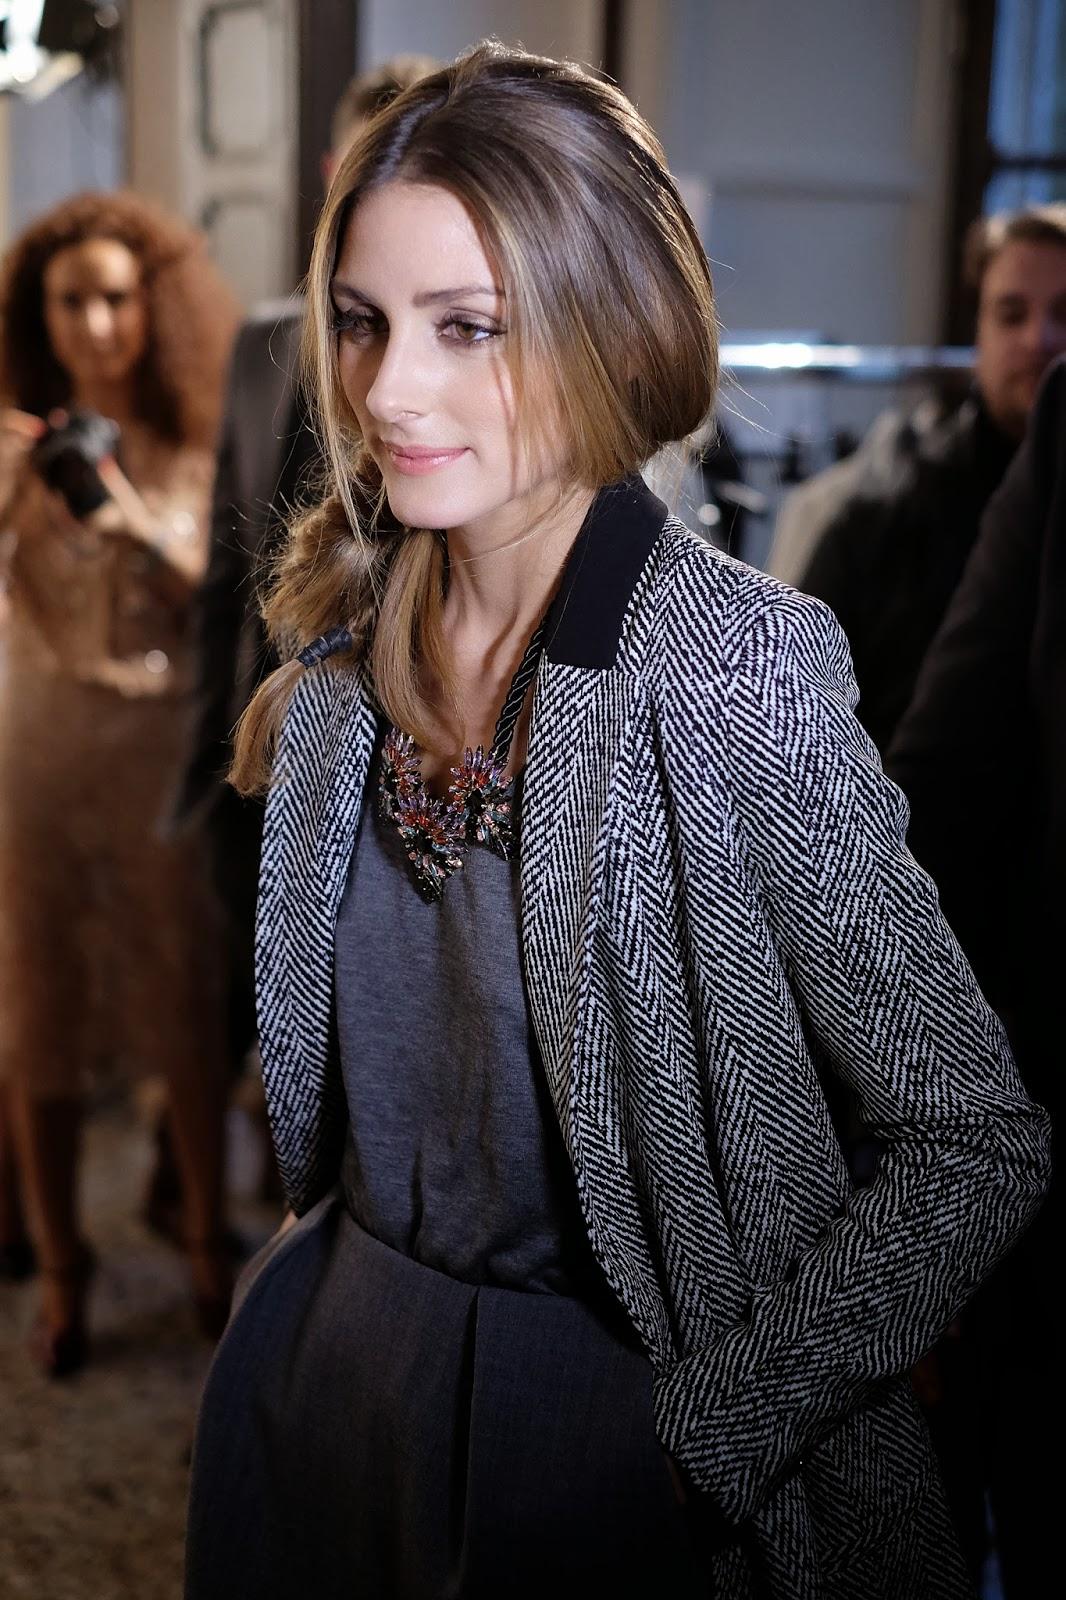 The Olivia Palermo Lookbook : Olivia Palermo during Milan ...